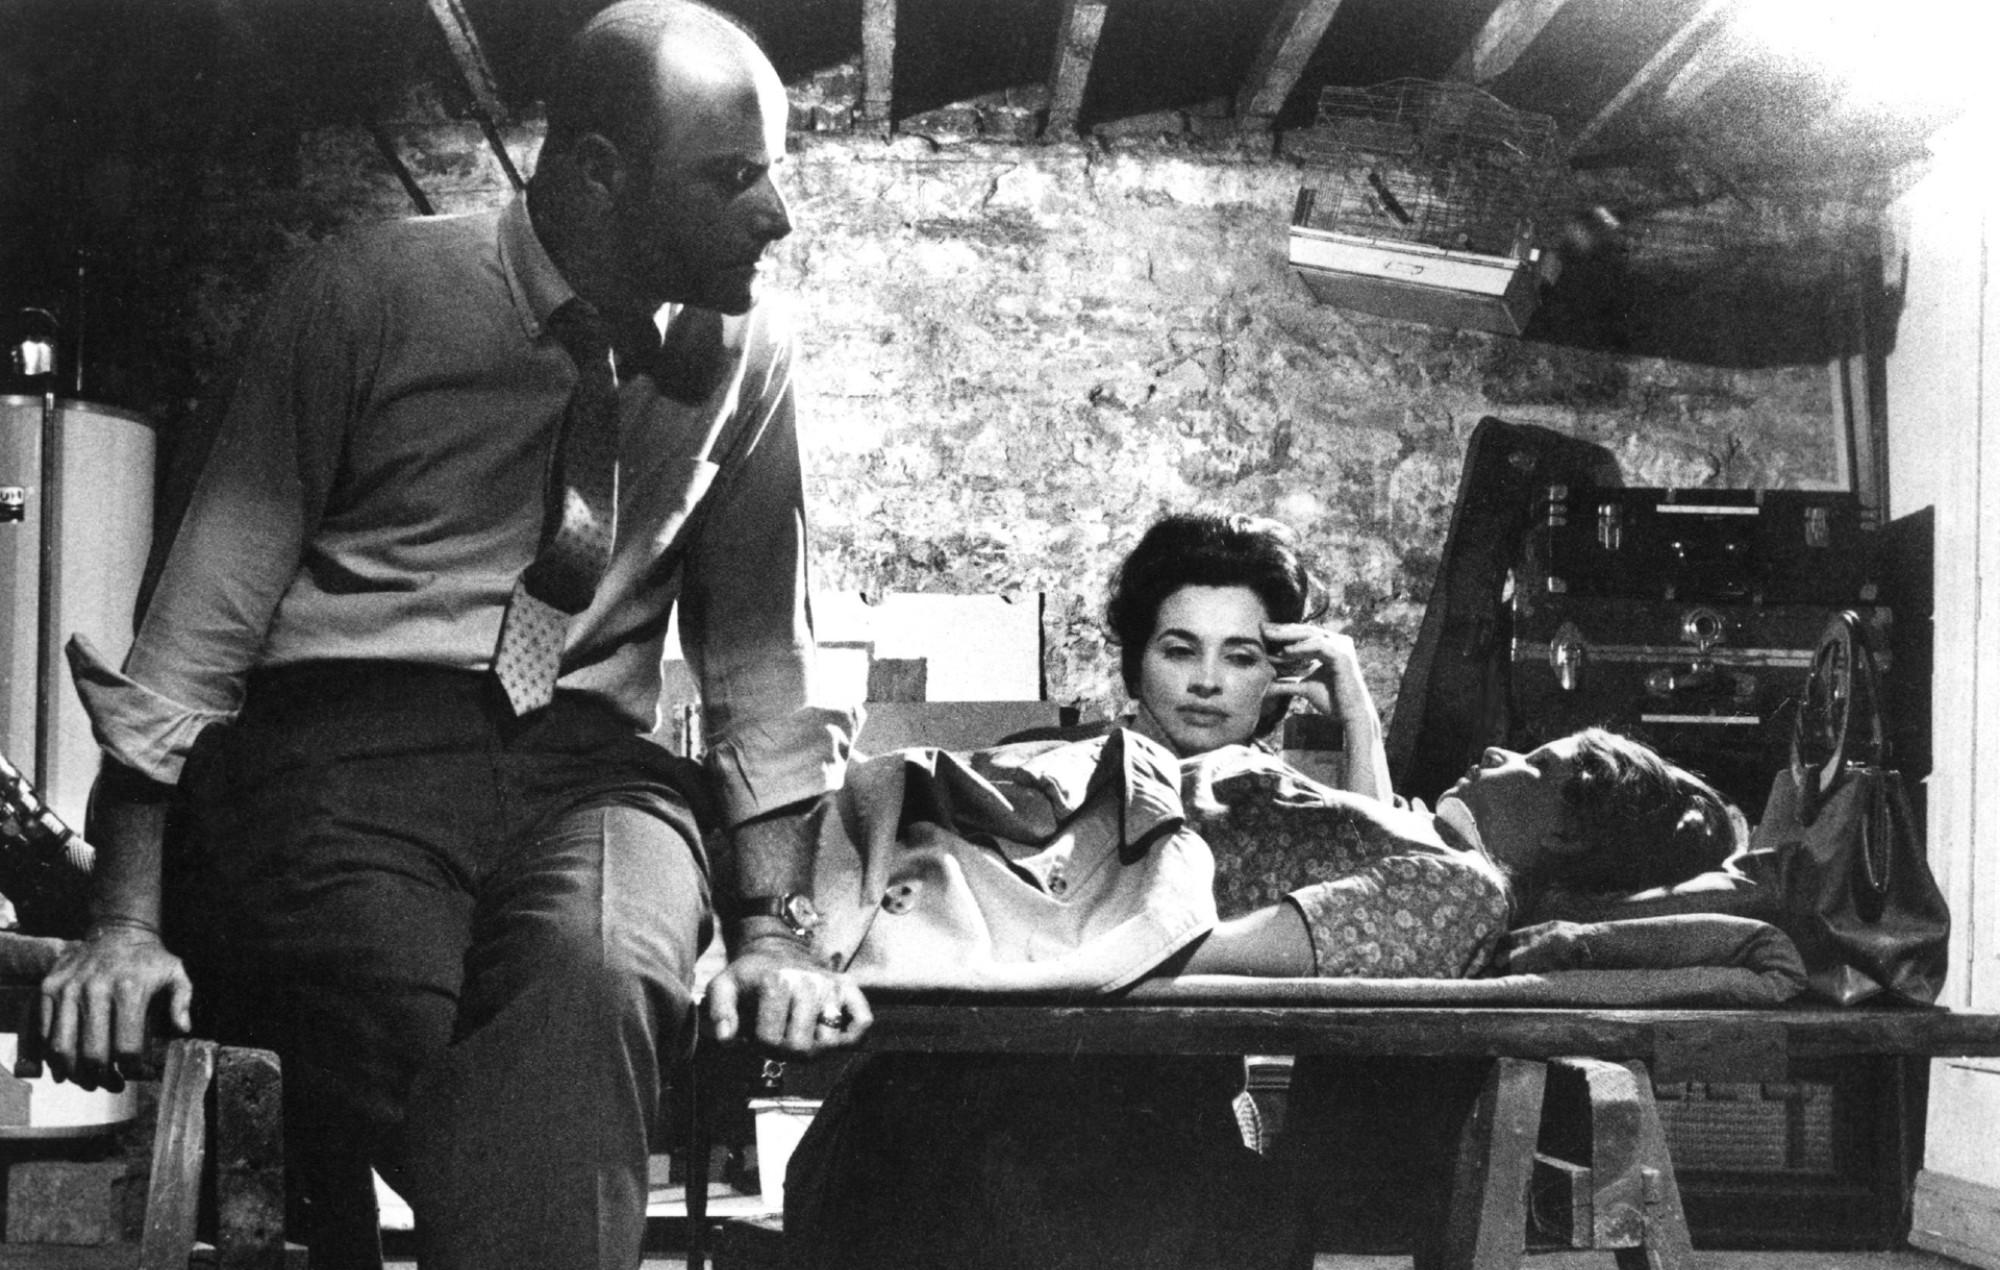 Marilyn Eastman, night of the living dead